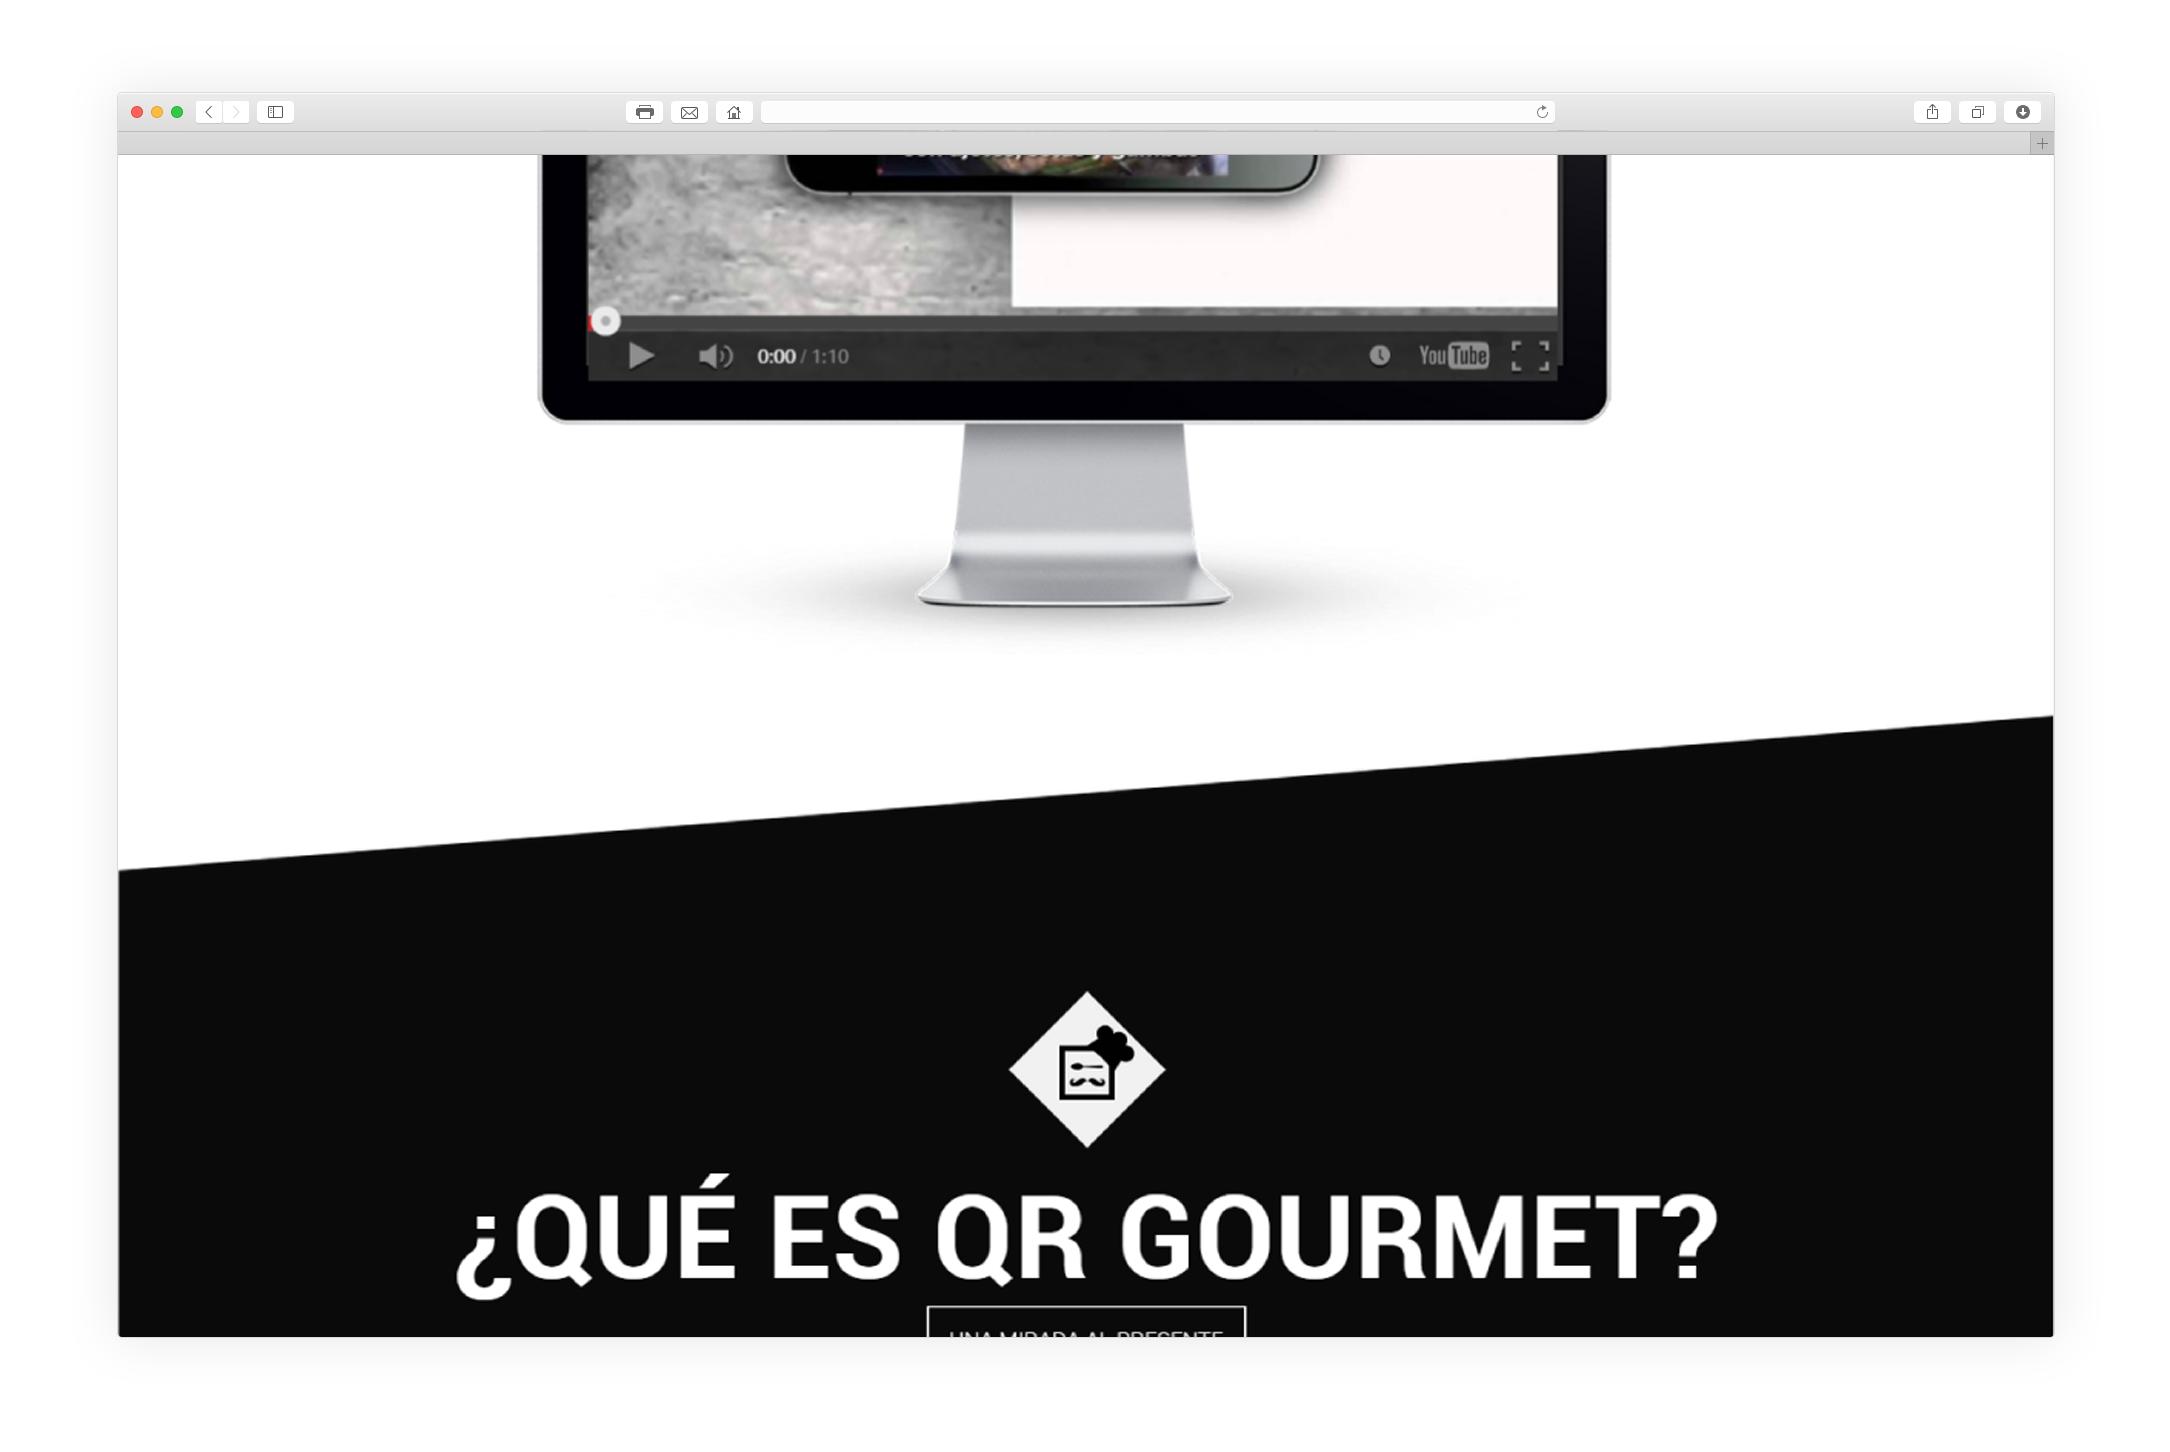 qrgourmet02DEF